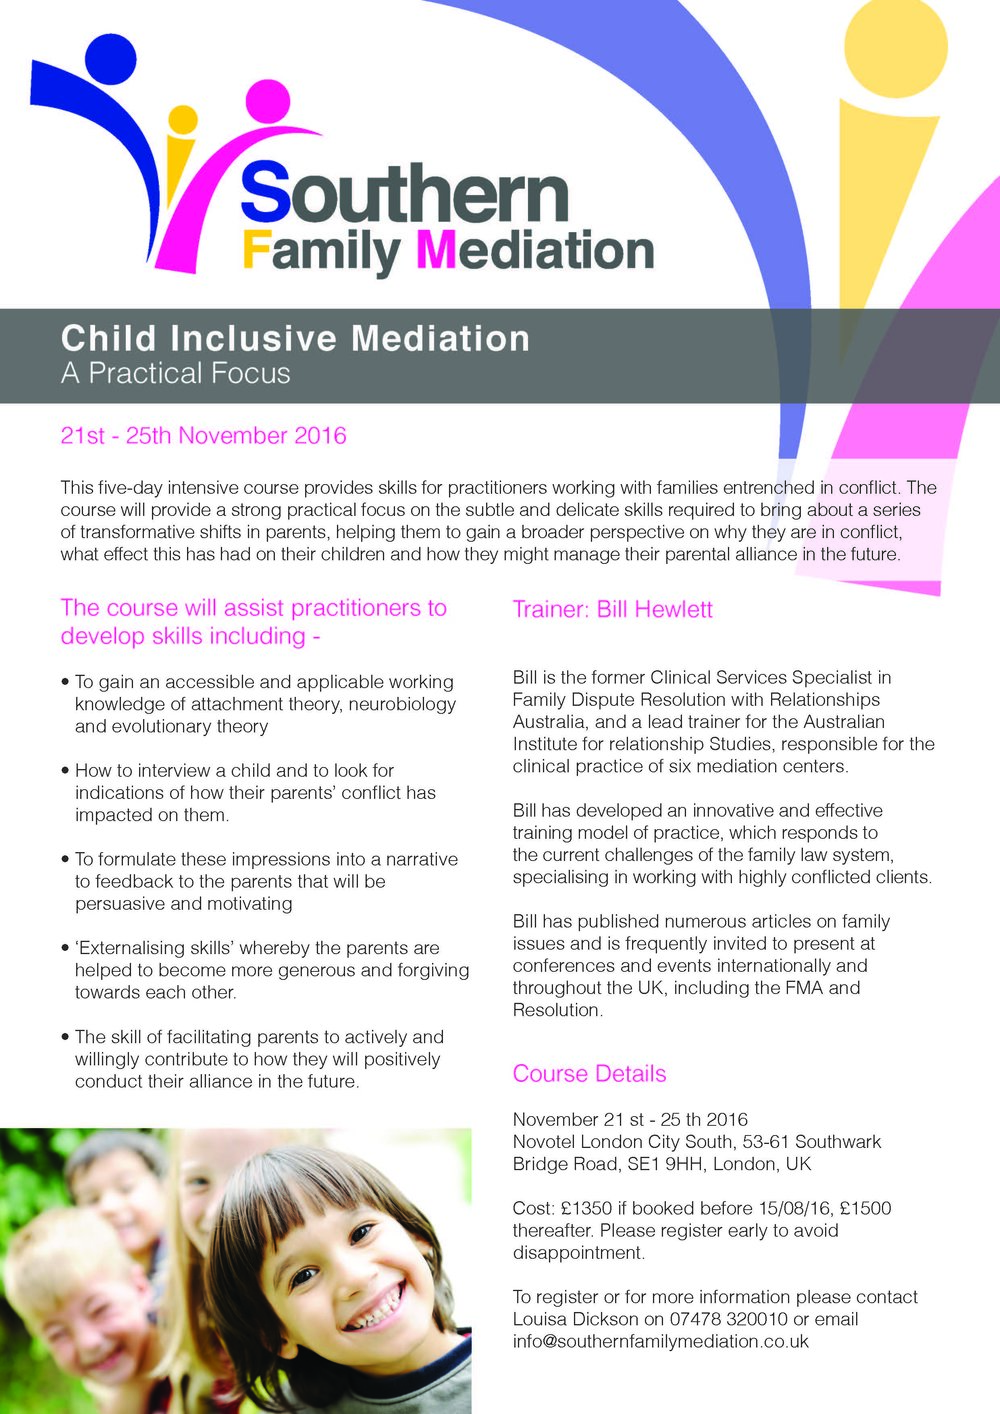 Child Inclusive Mediation Training by Bill Hewlett